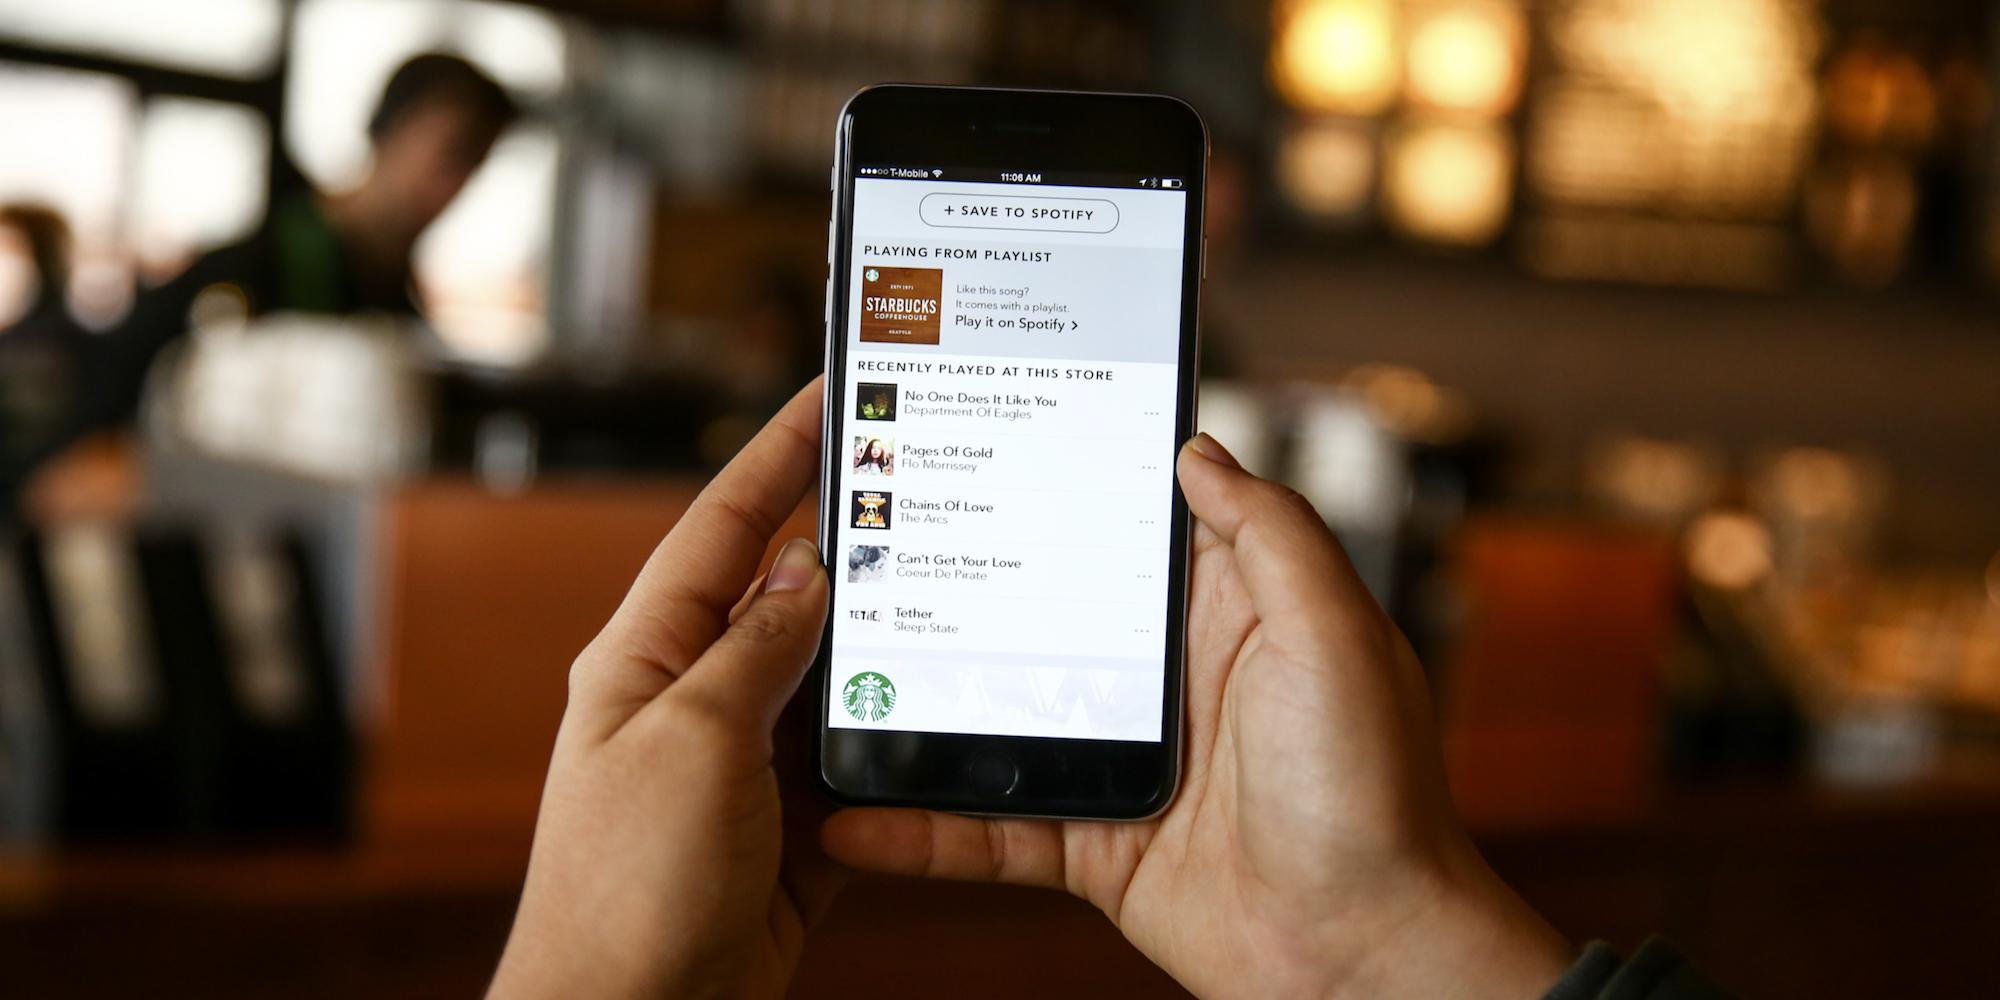 Starbucks-Spotify